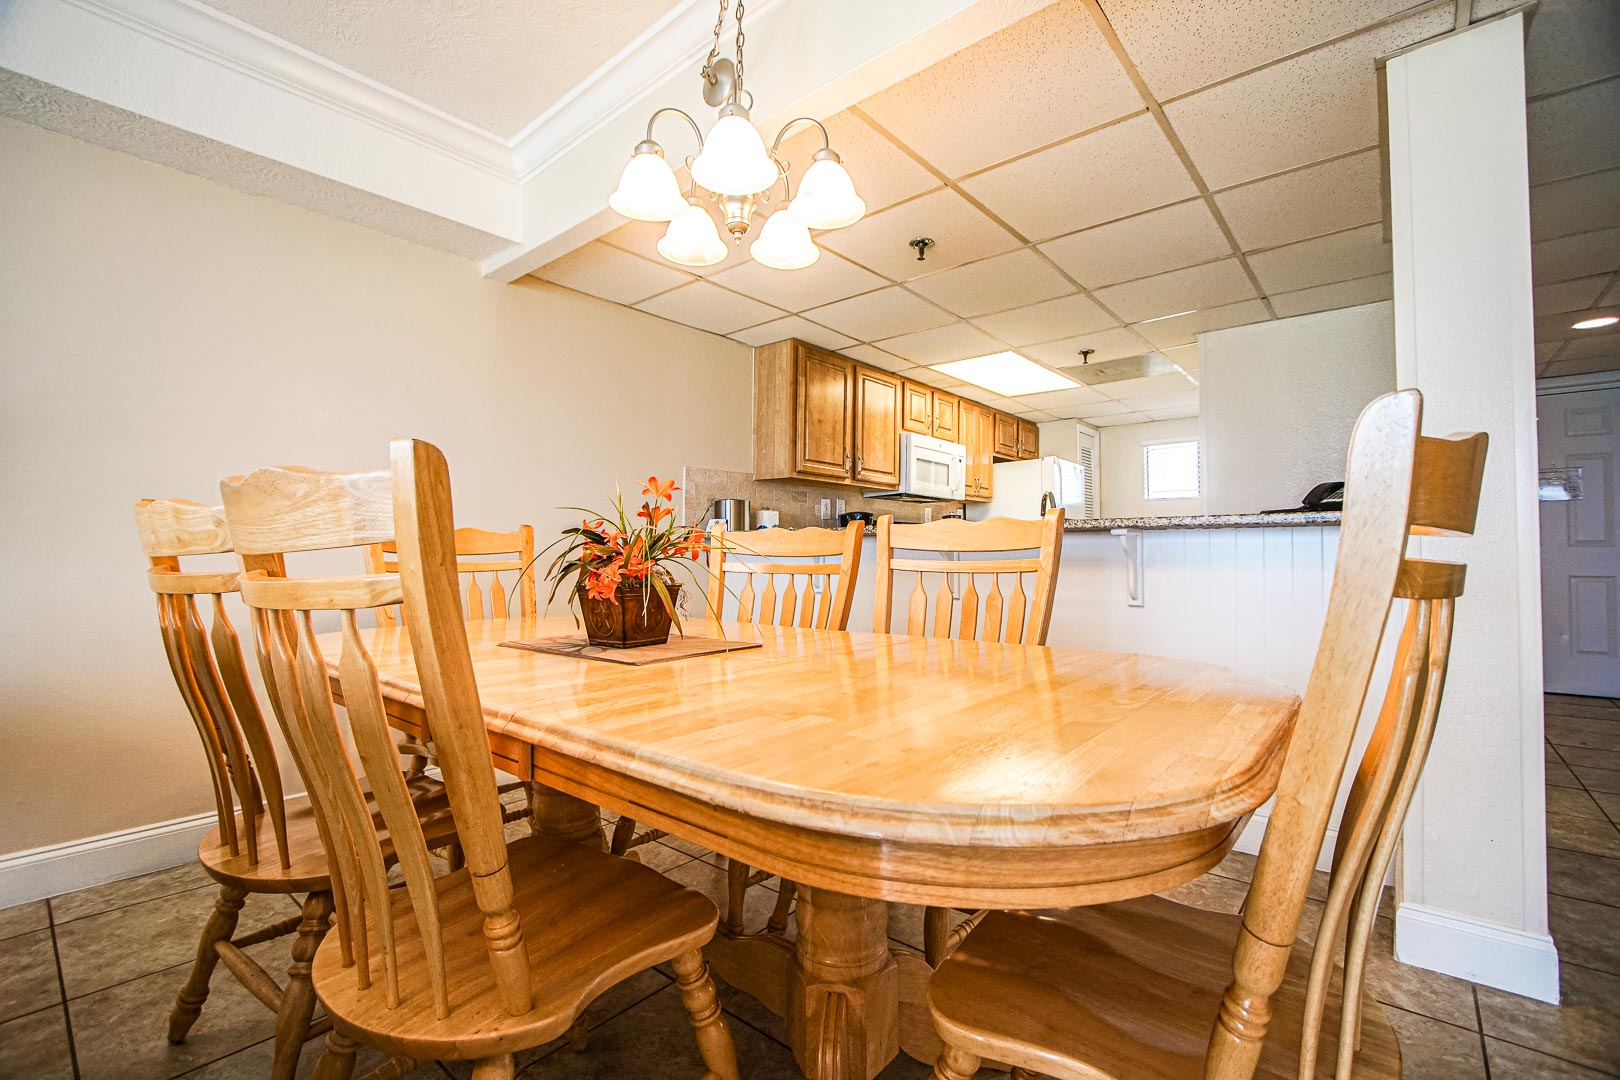 Landmark Holiday Beach Resort - Unit Interior -Living Room